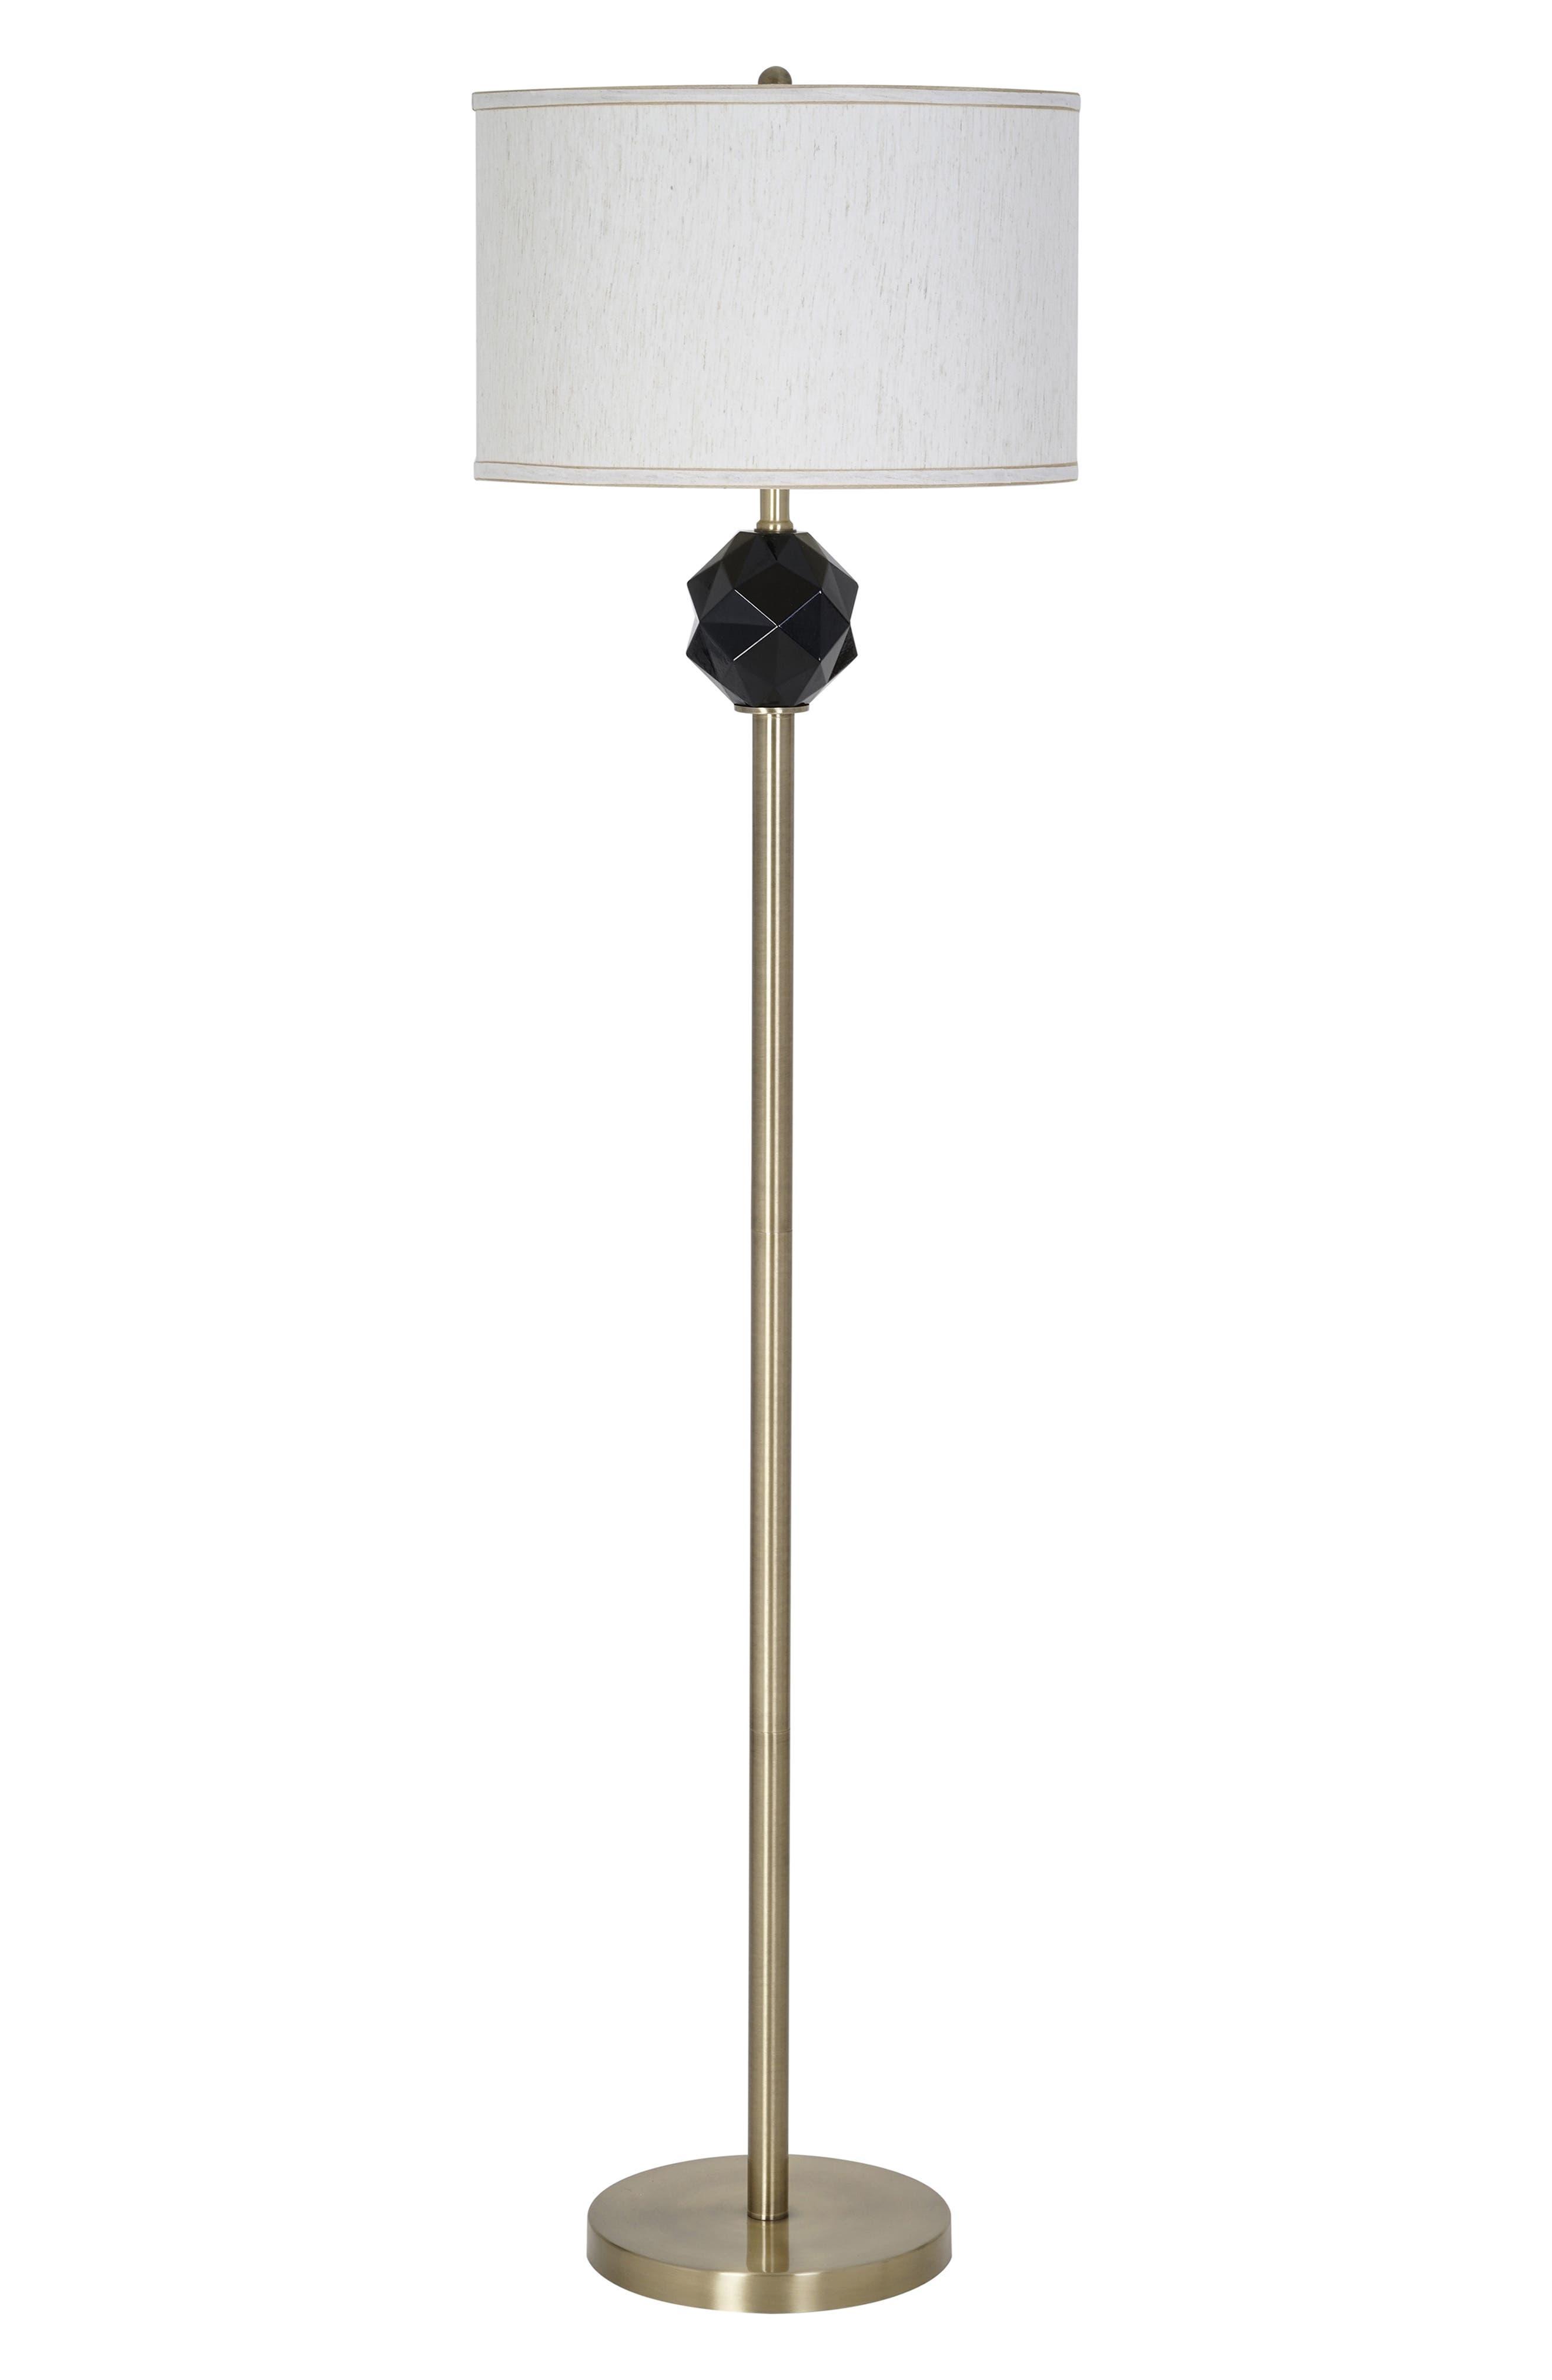 Jalexander Lighting Dash Floor Lamp Size One Size  Black